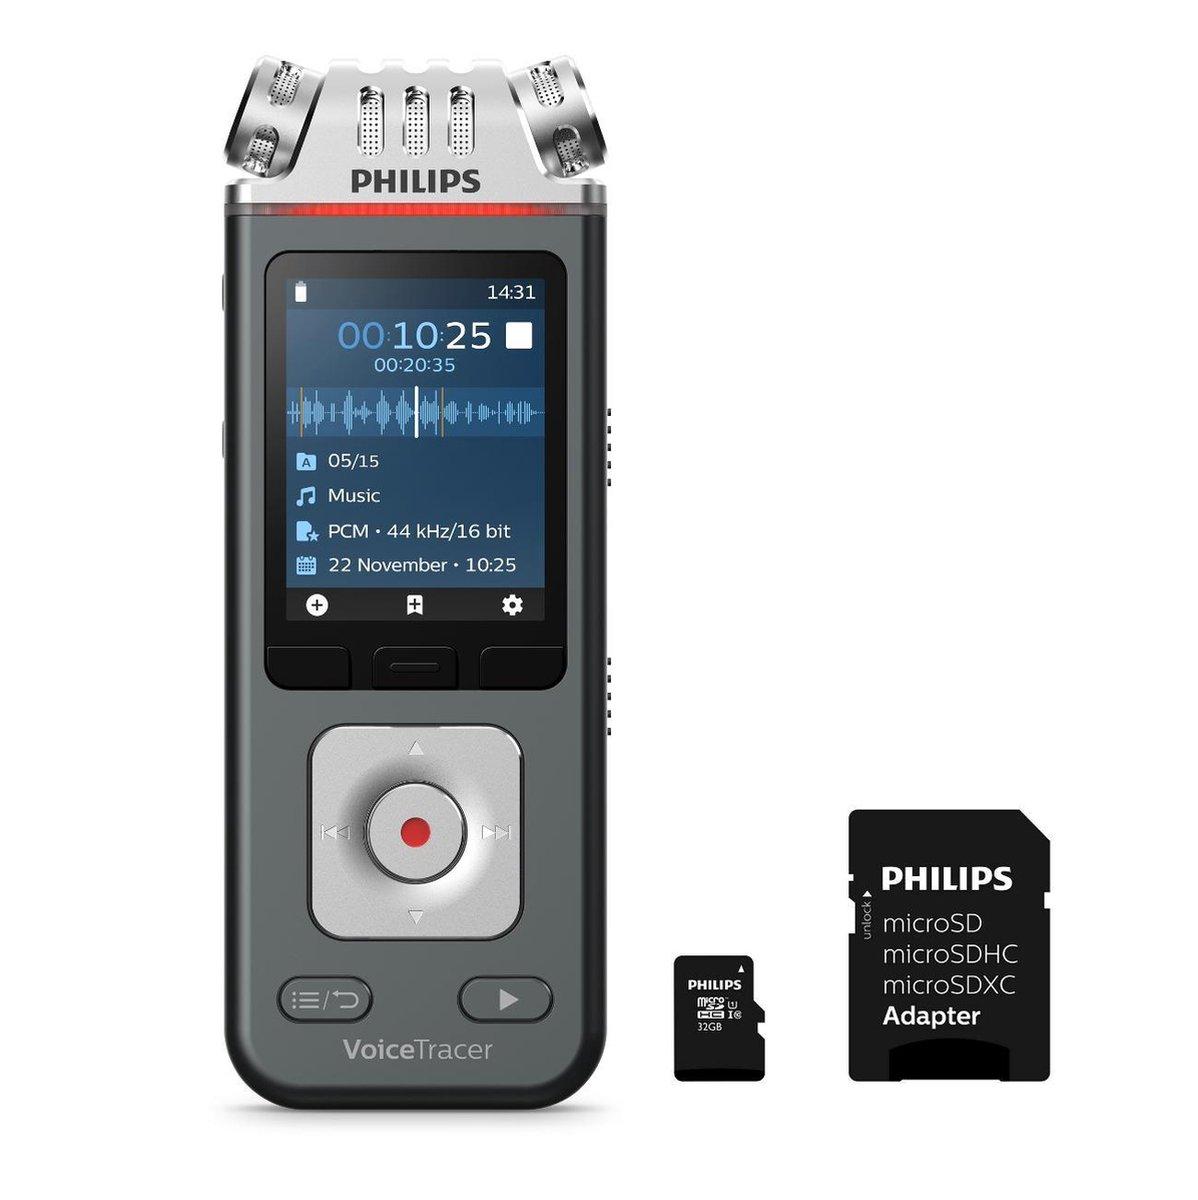 Philips VoiceTracer Audiorecorder DVT61132   3MIC Stereo MP3/PCM - 24-bits/96 kHz, 8GB, Smartphone app, USB-C, Kleurendisplay, Accu, incl. microSD 32 GB kaart - adapter